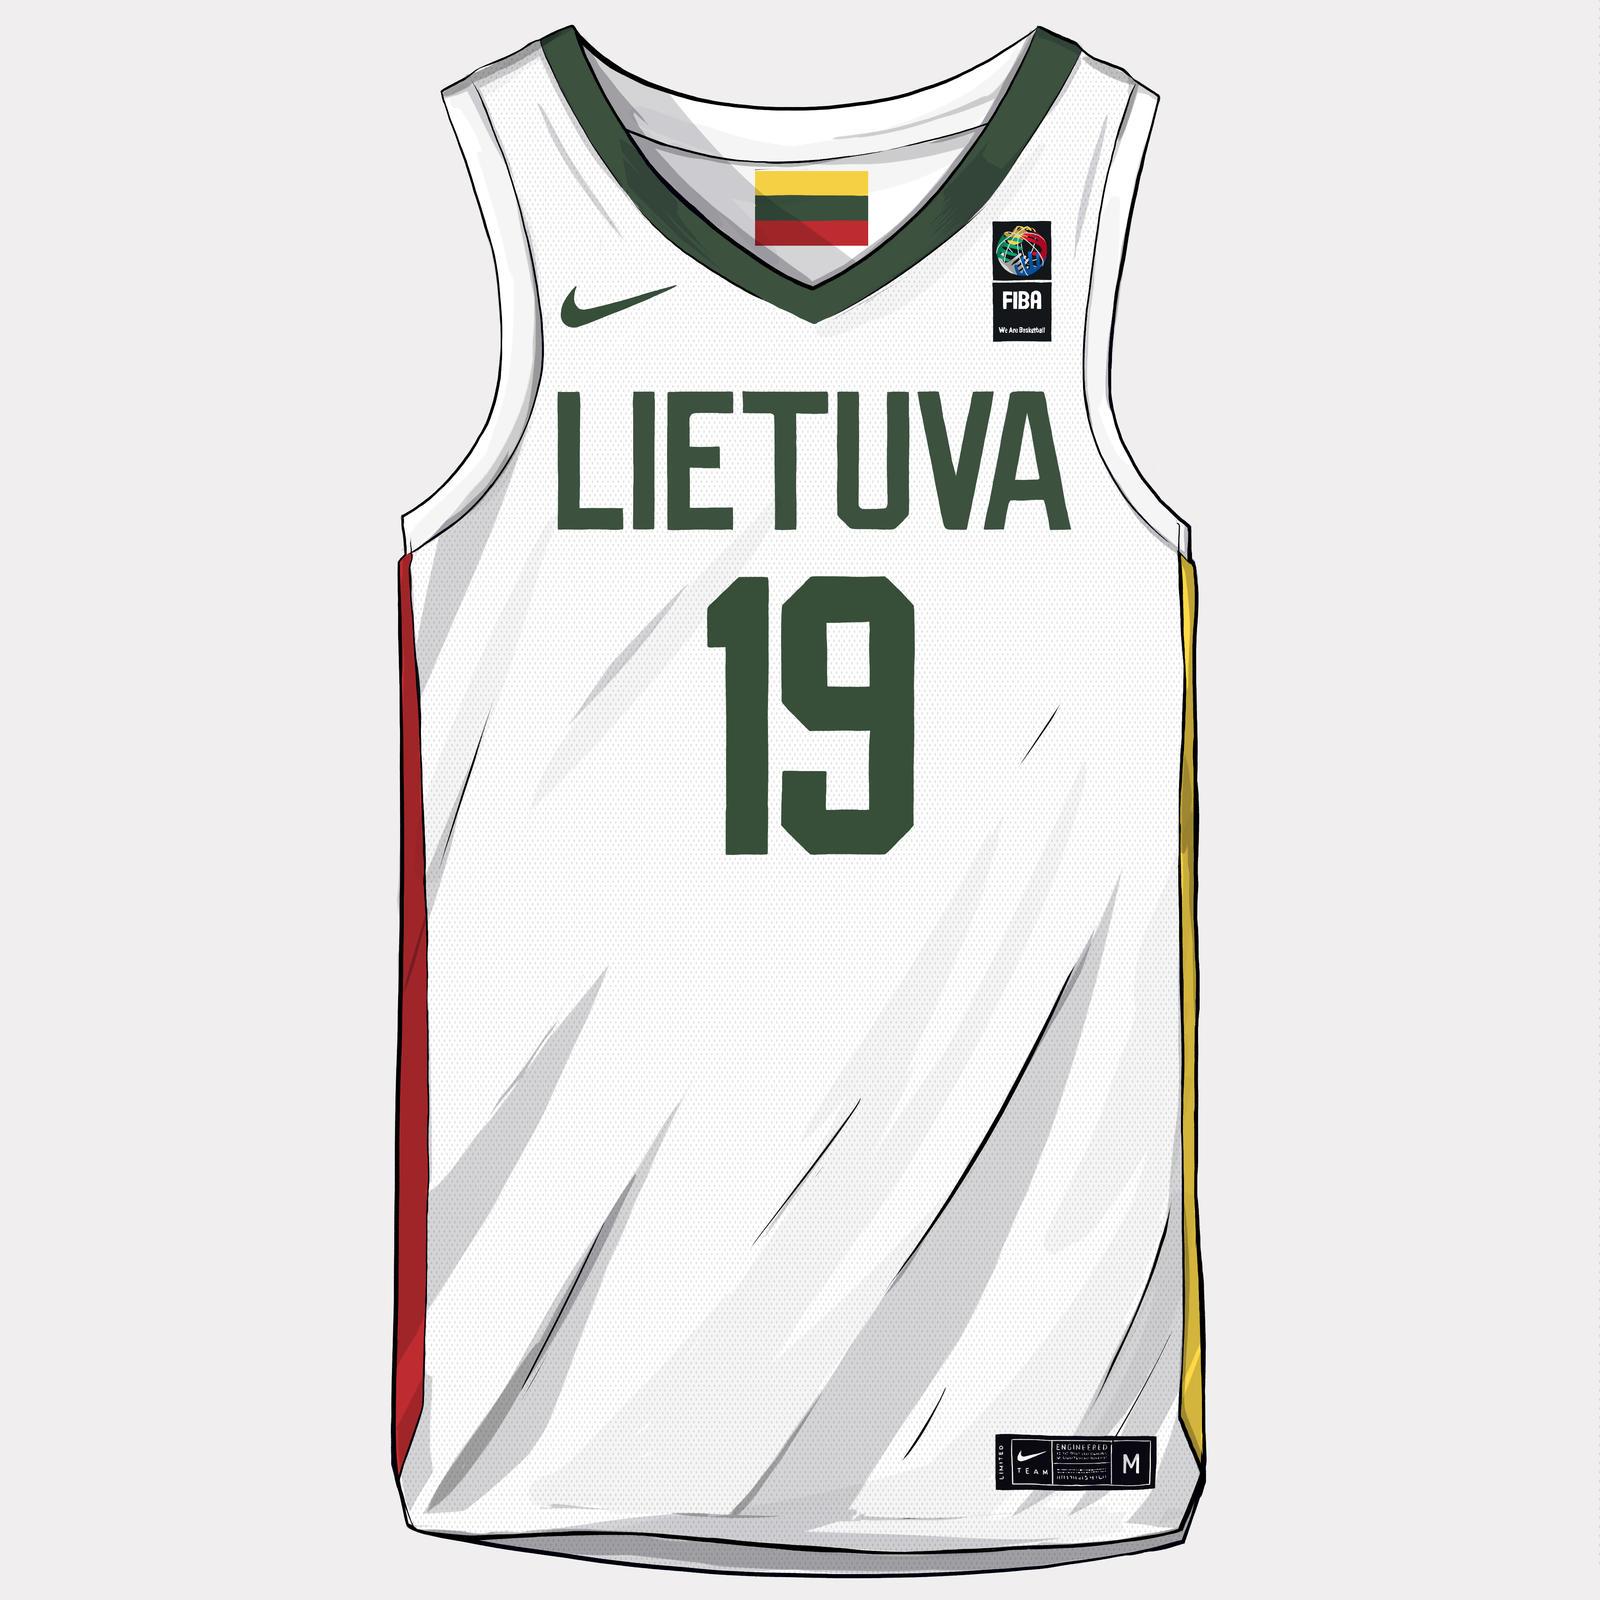 nike-news-lithuania-national-team-kit-2019-illustration-1x1_2_89536.jpg